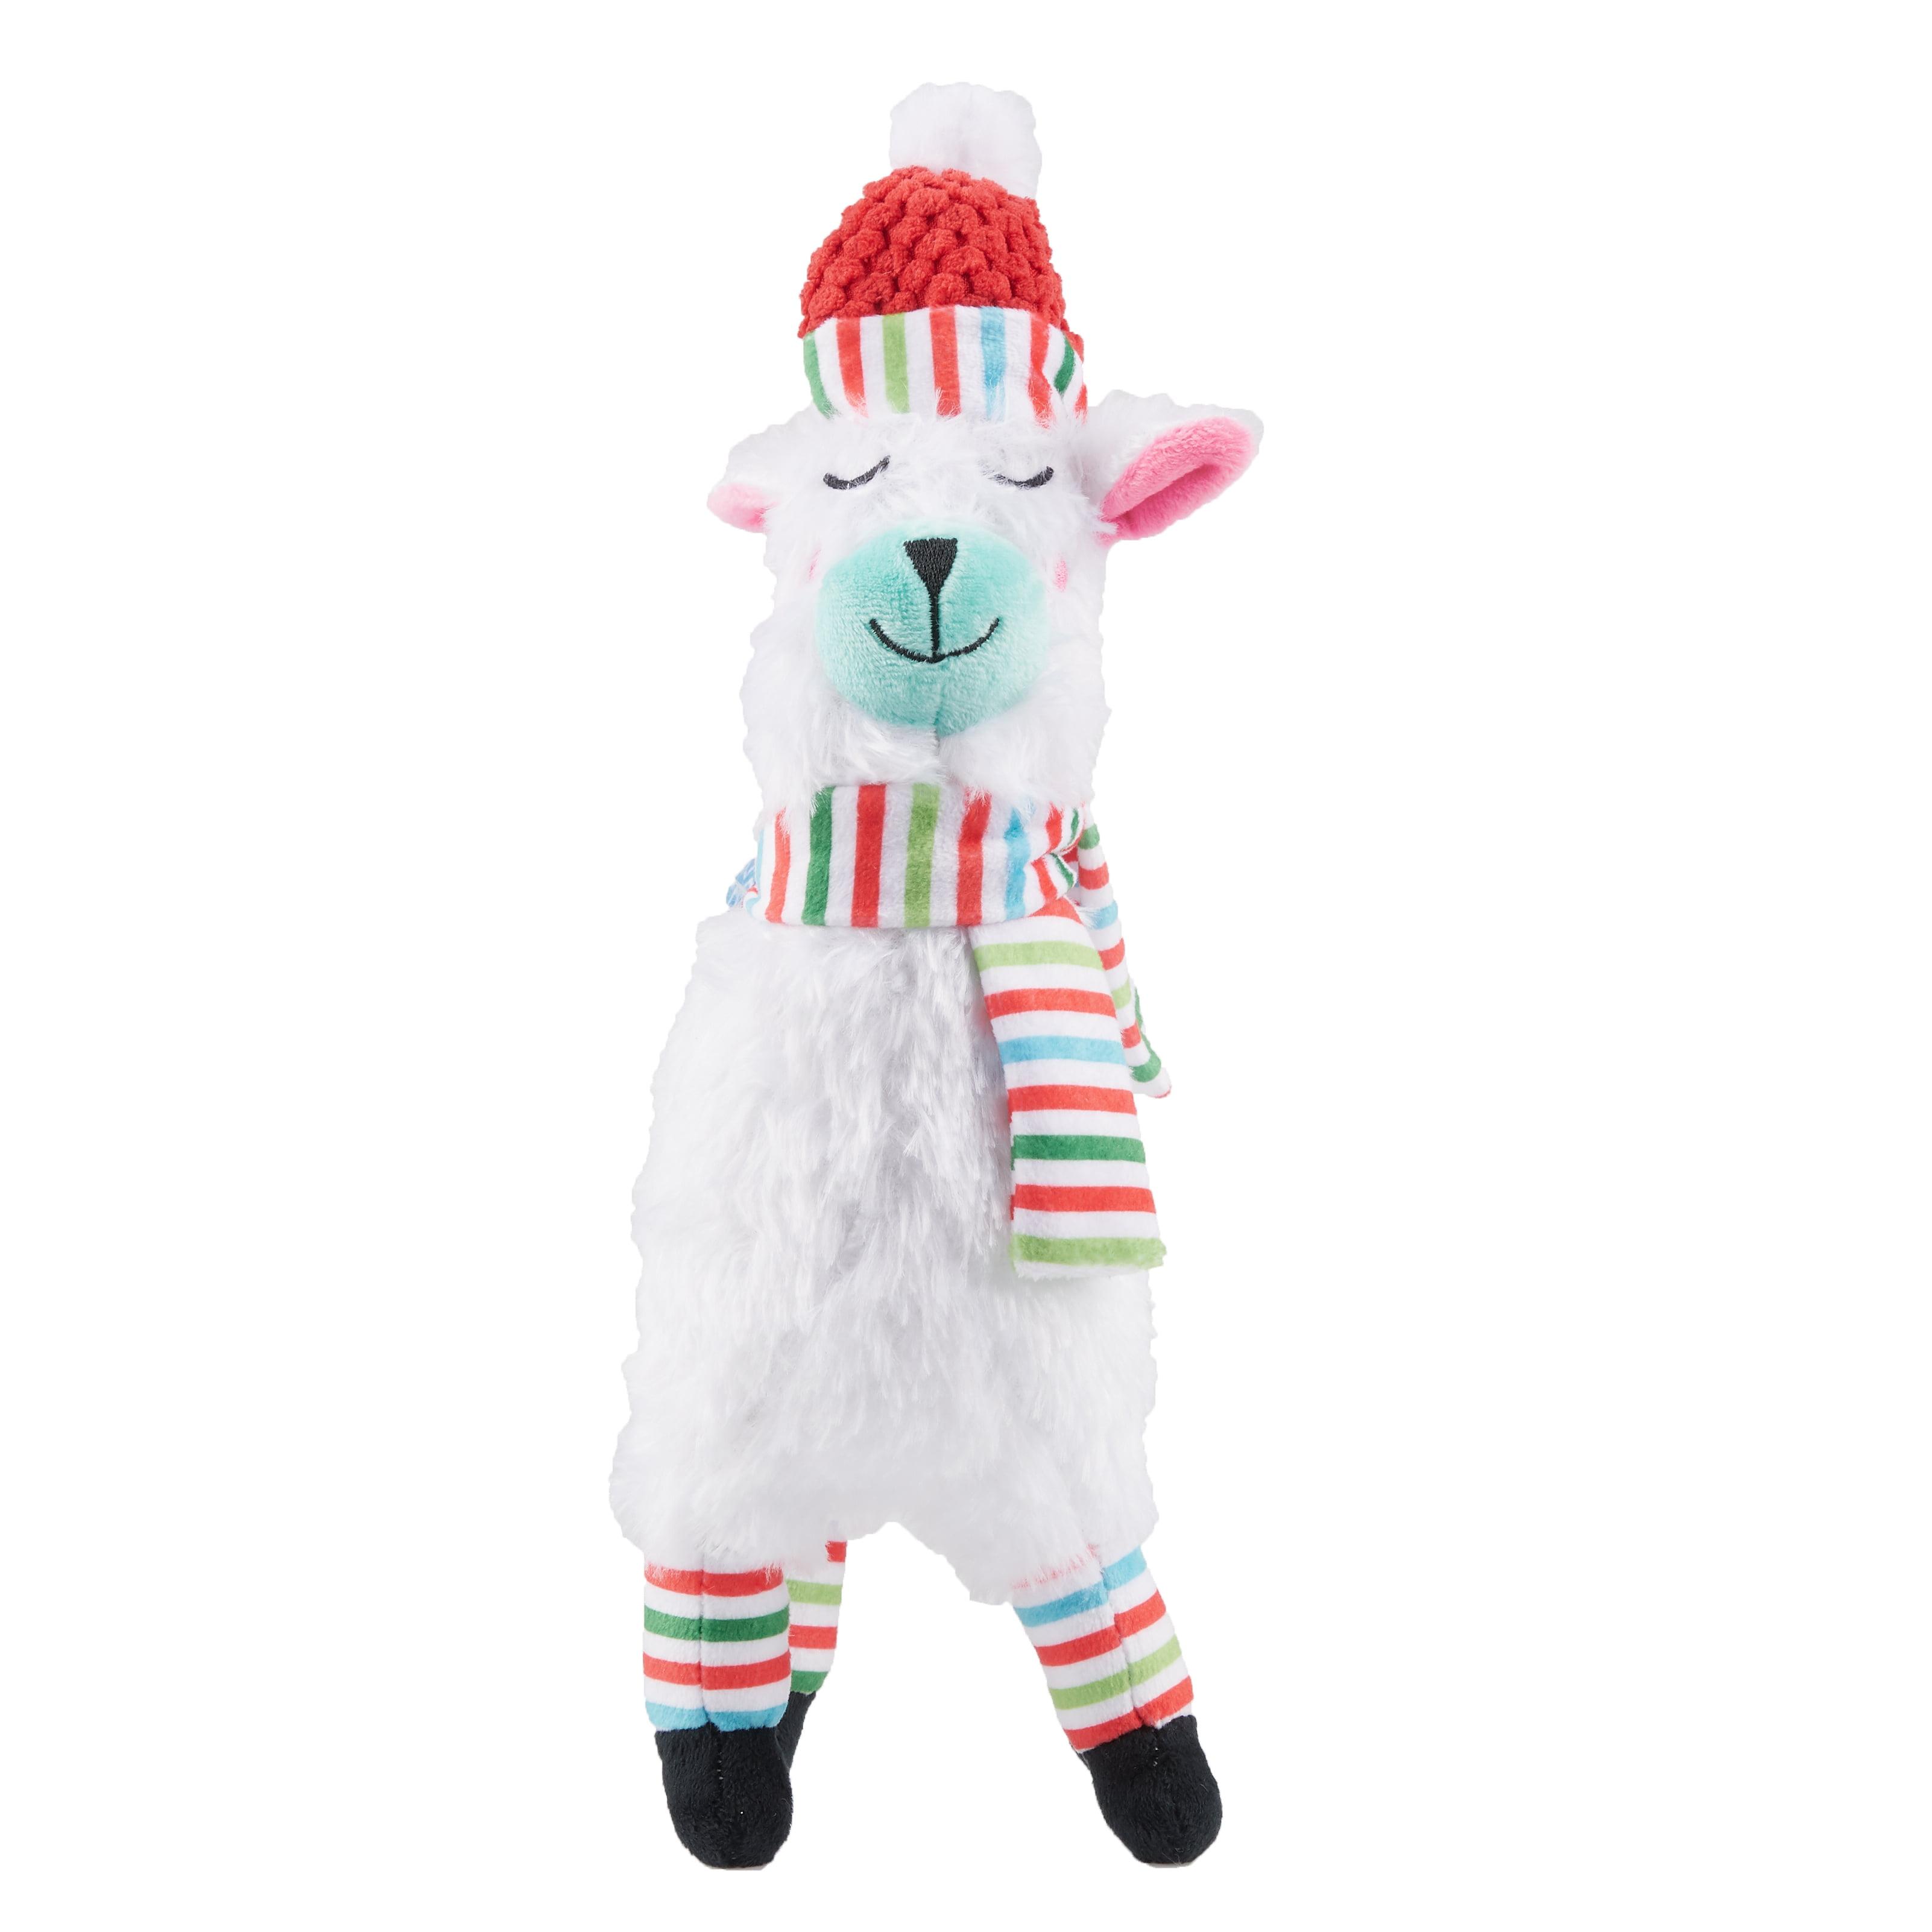 Winter Squeaky Plush Dog Toy, Llama with Stripes - Walmart com